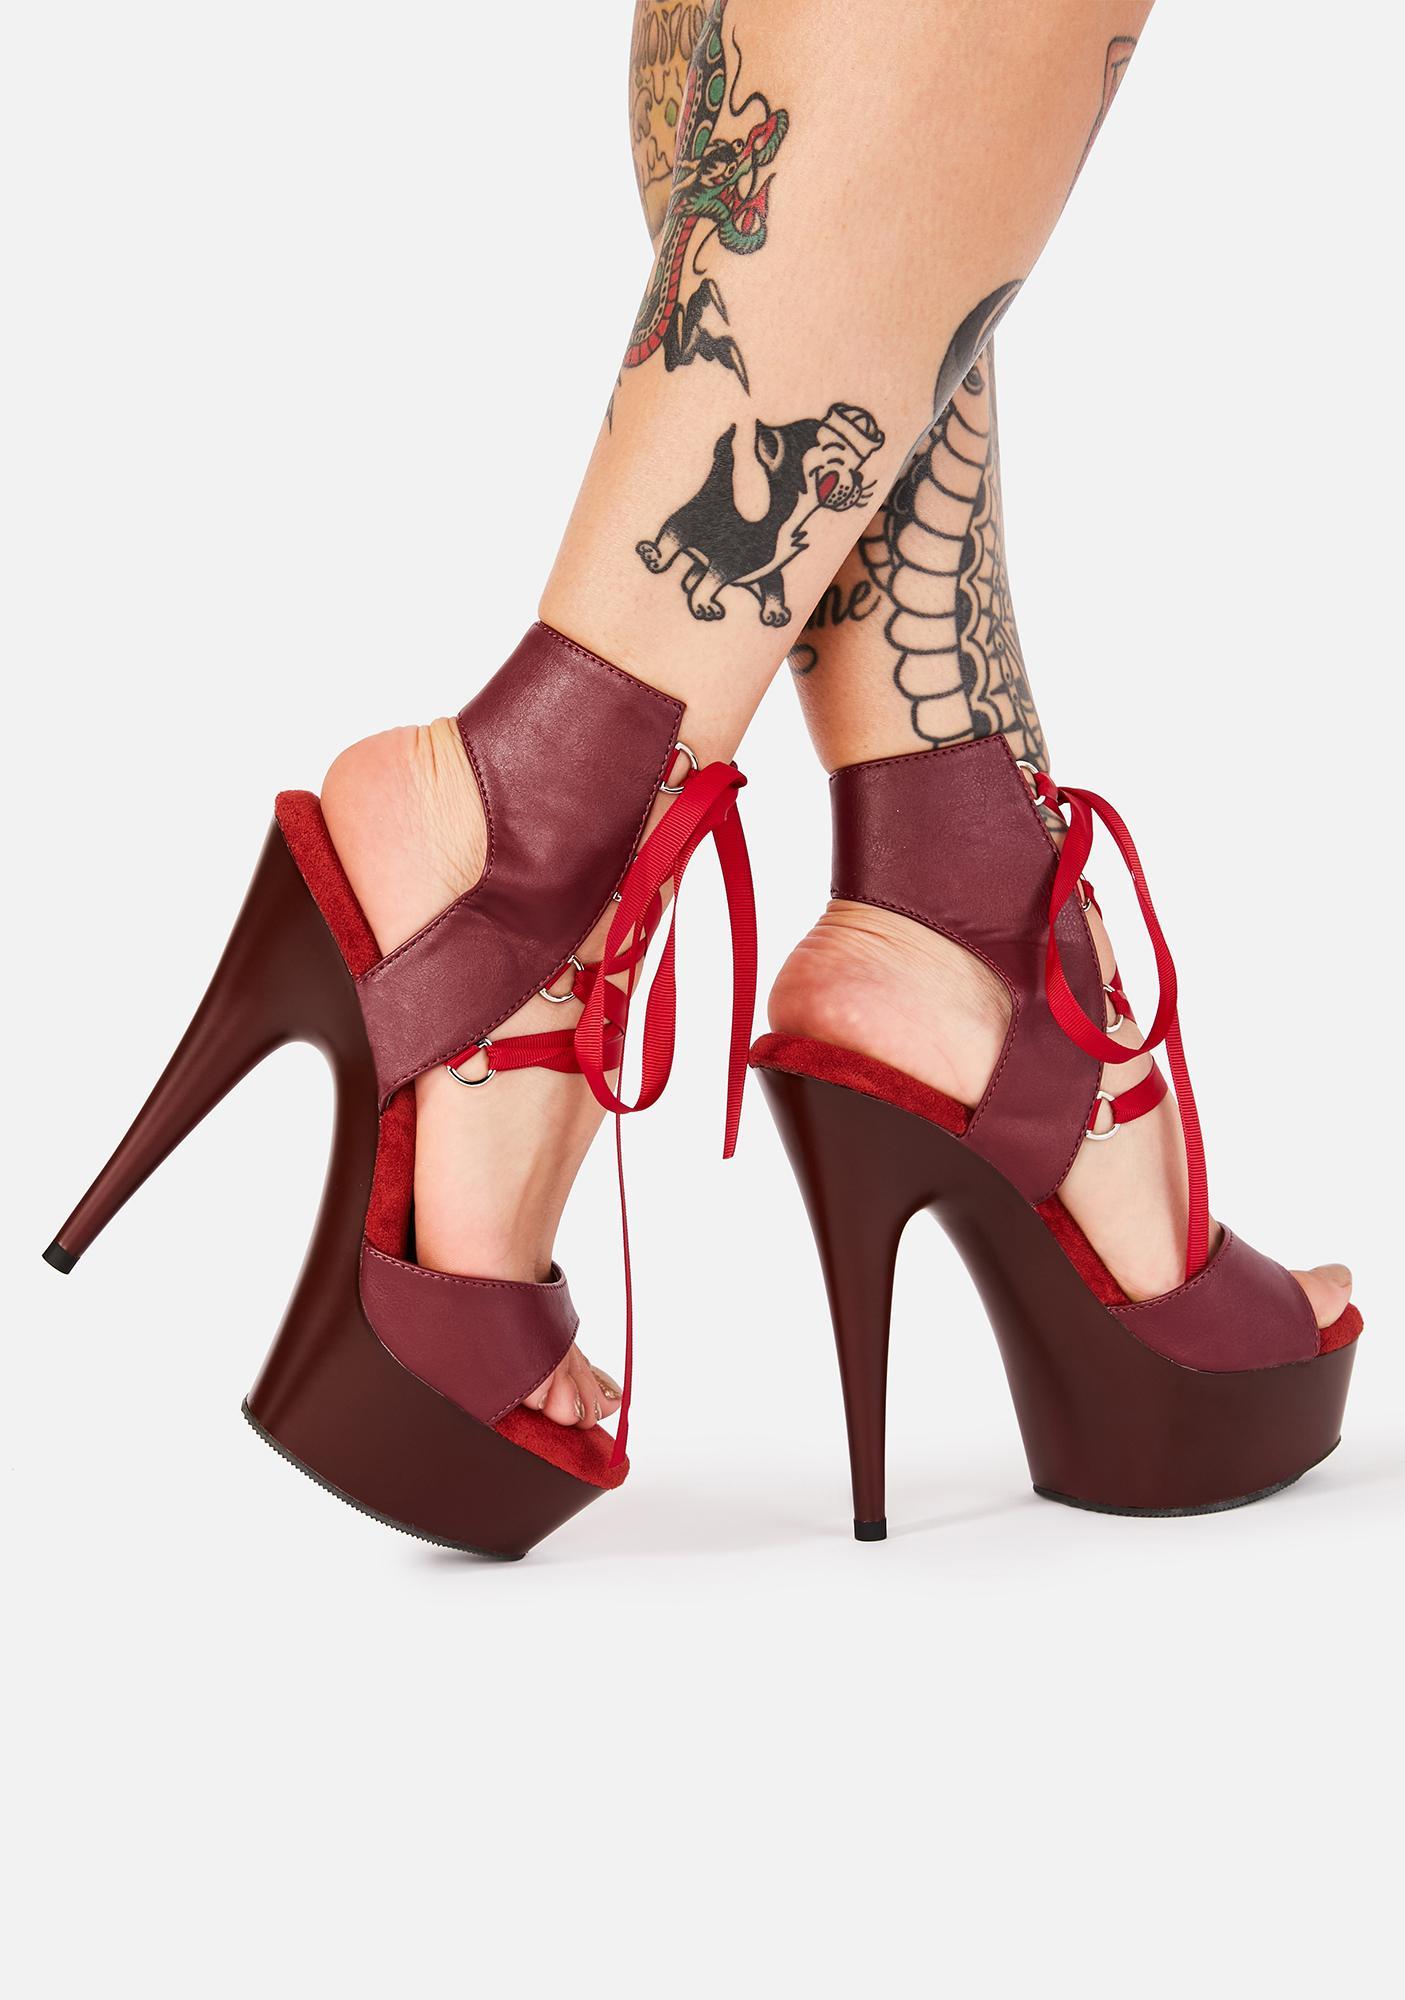 Pleaser Crimson Risky Baby Platform Heels